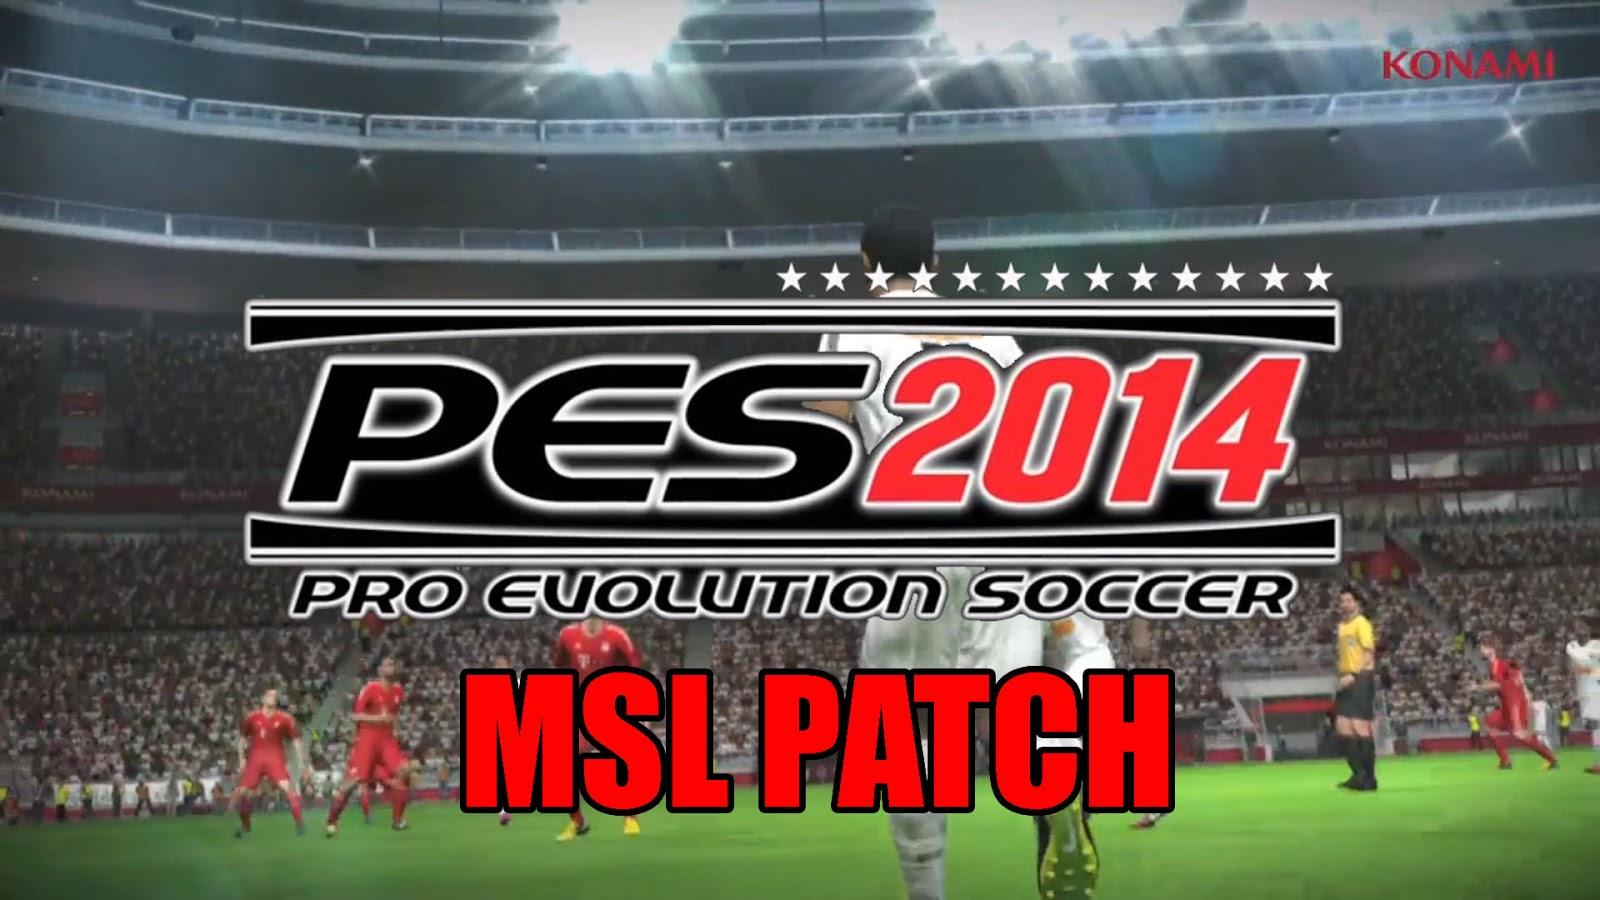 PES malaysia super league : PES 2014 malaysia super league patch